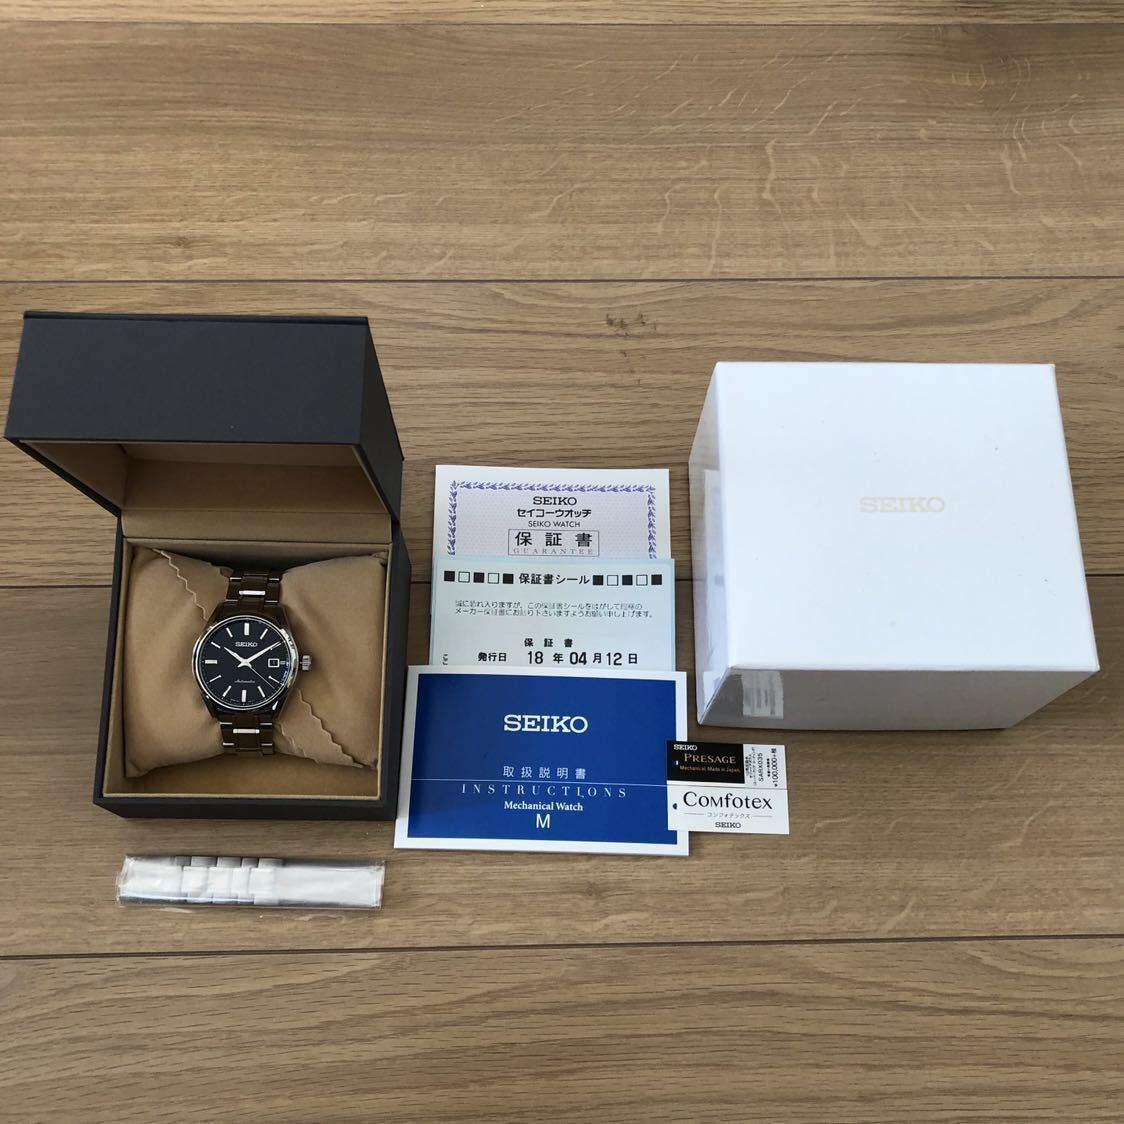 SEIKO PRESAGE SARX035 セイコー プレザージュ 機械式 メカニカル 腕時計 自動巻_画像2